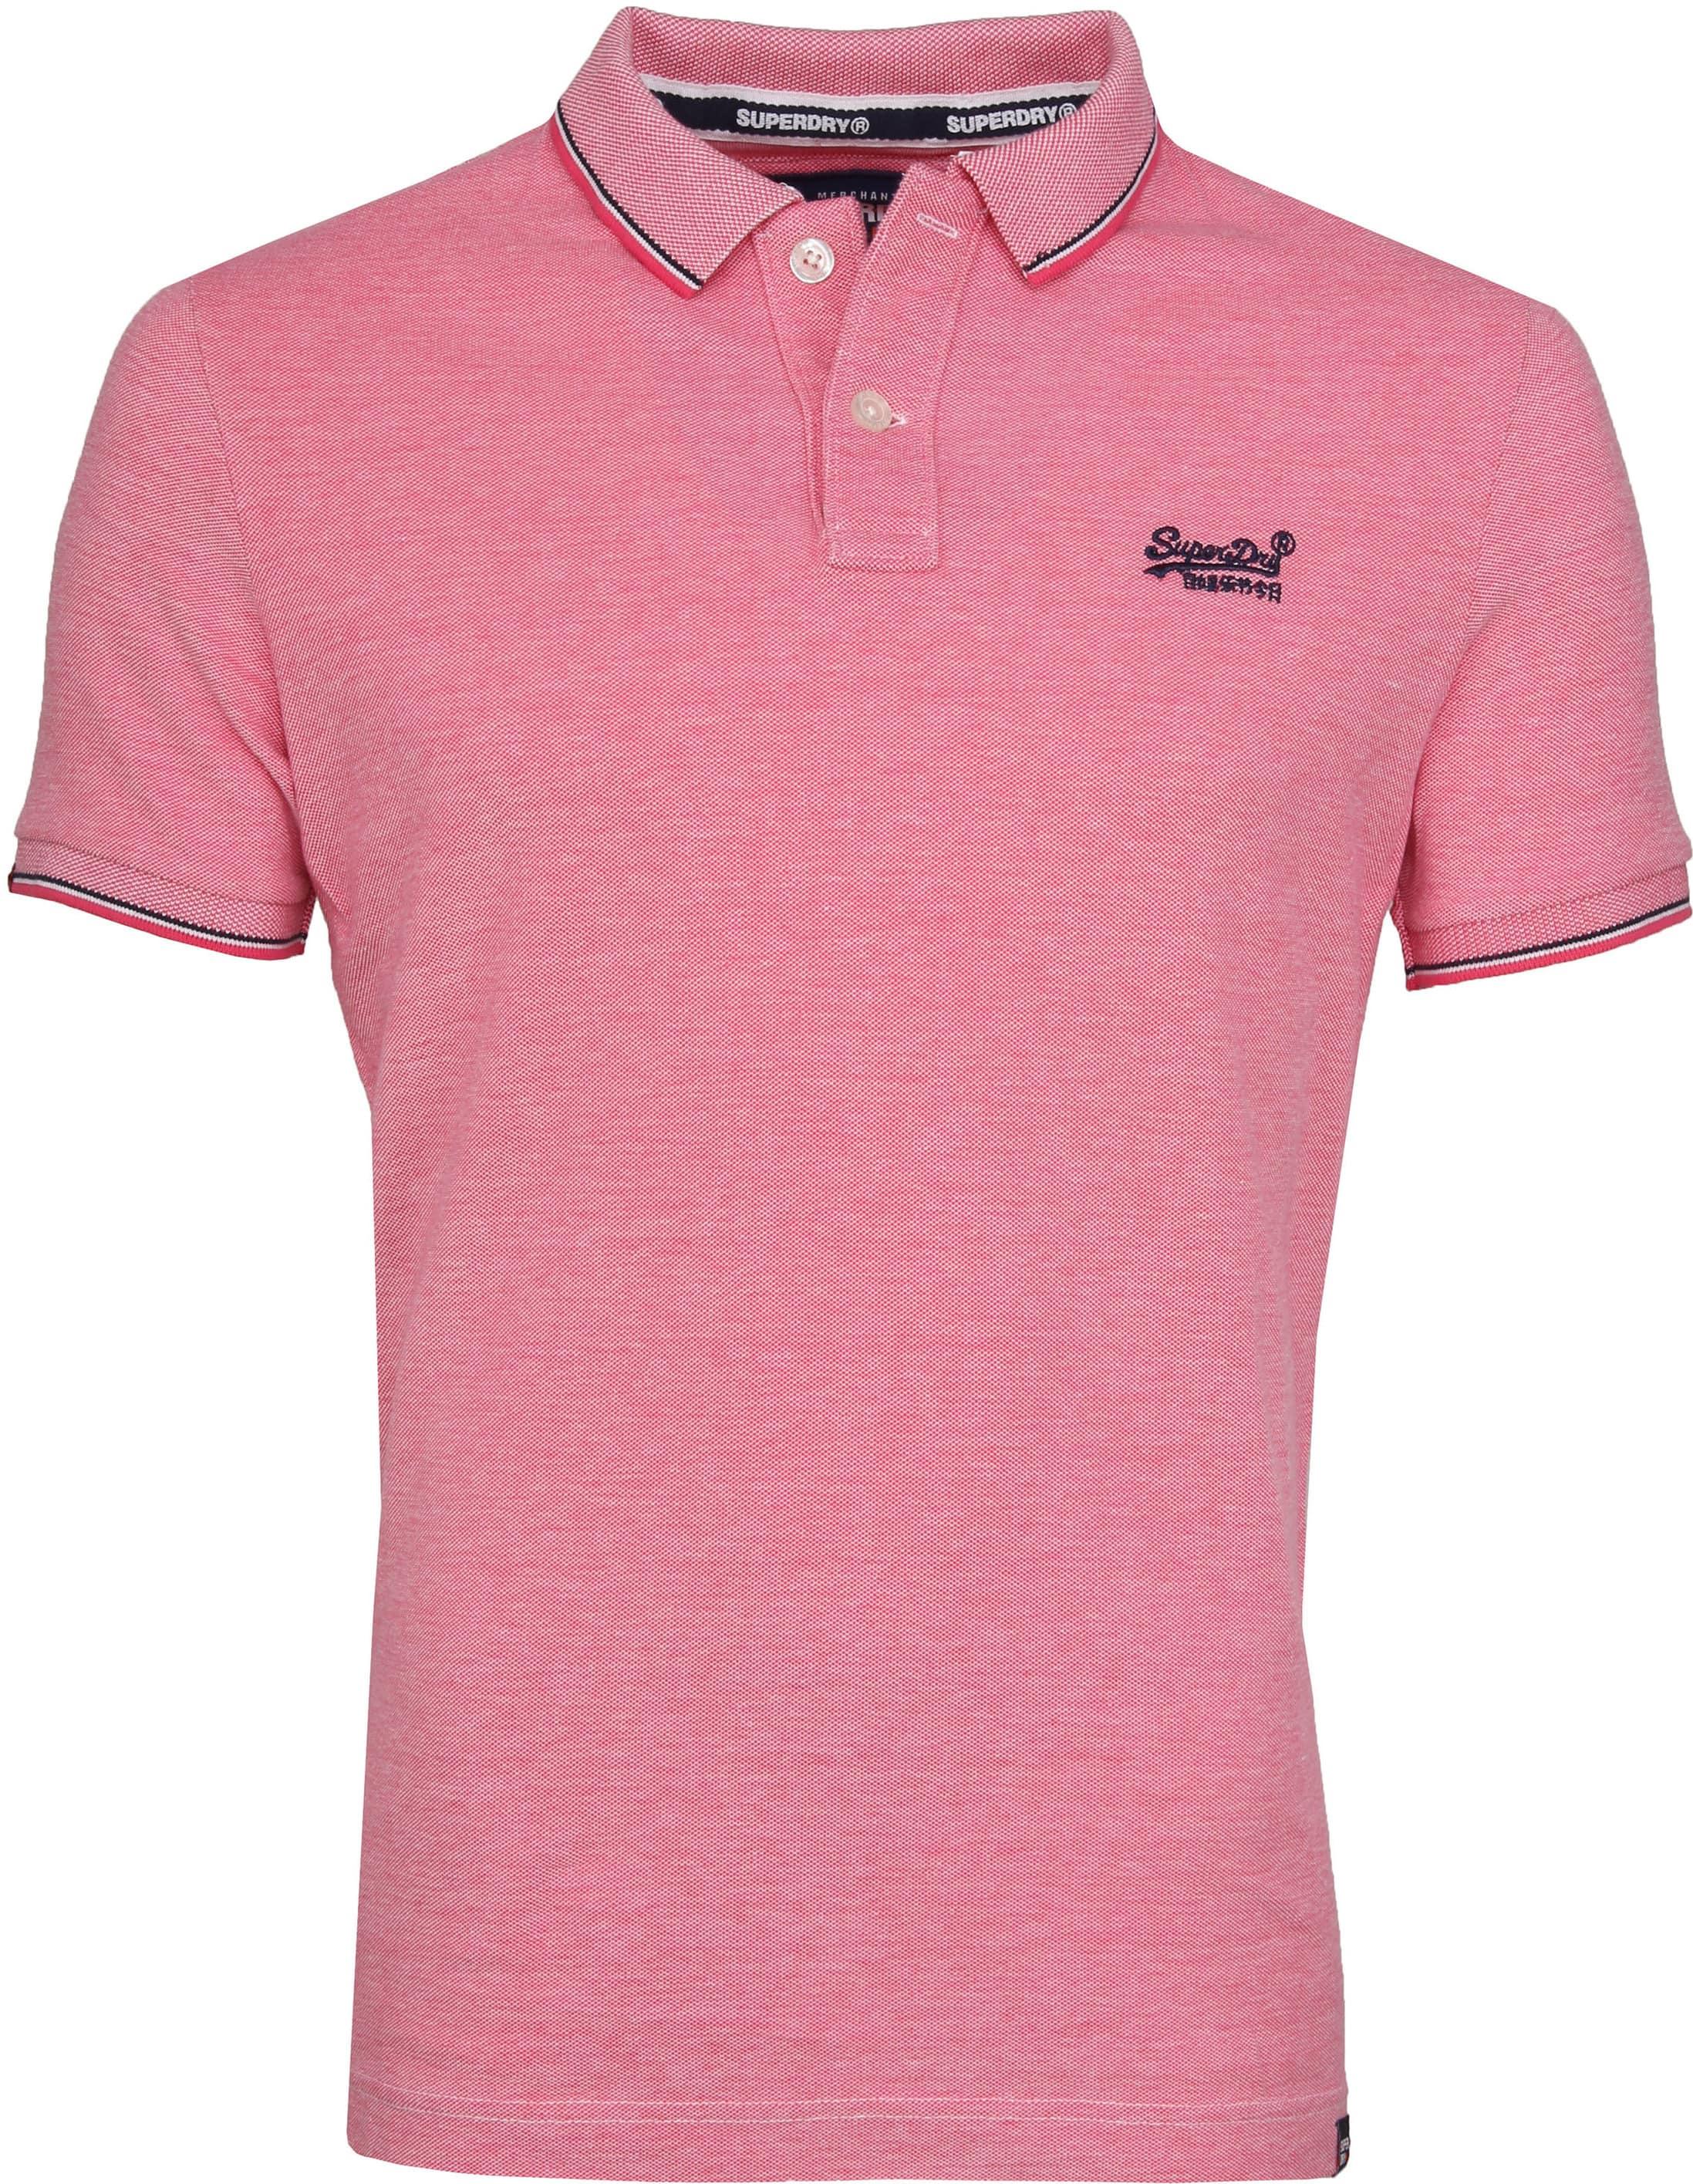 Superdry Premium Polo Pink foto 0